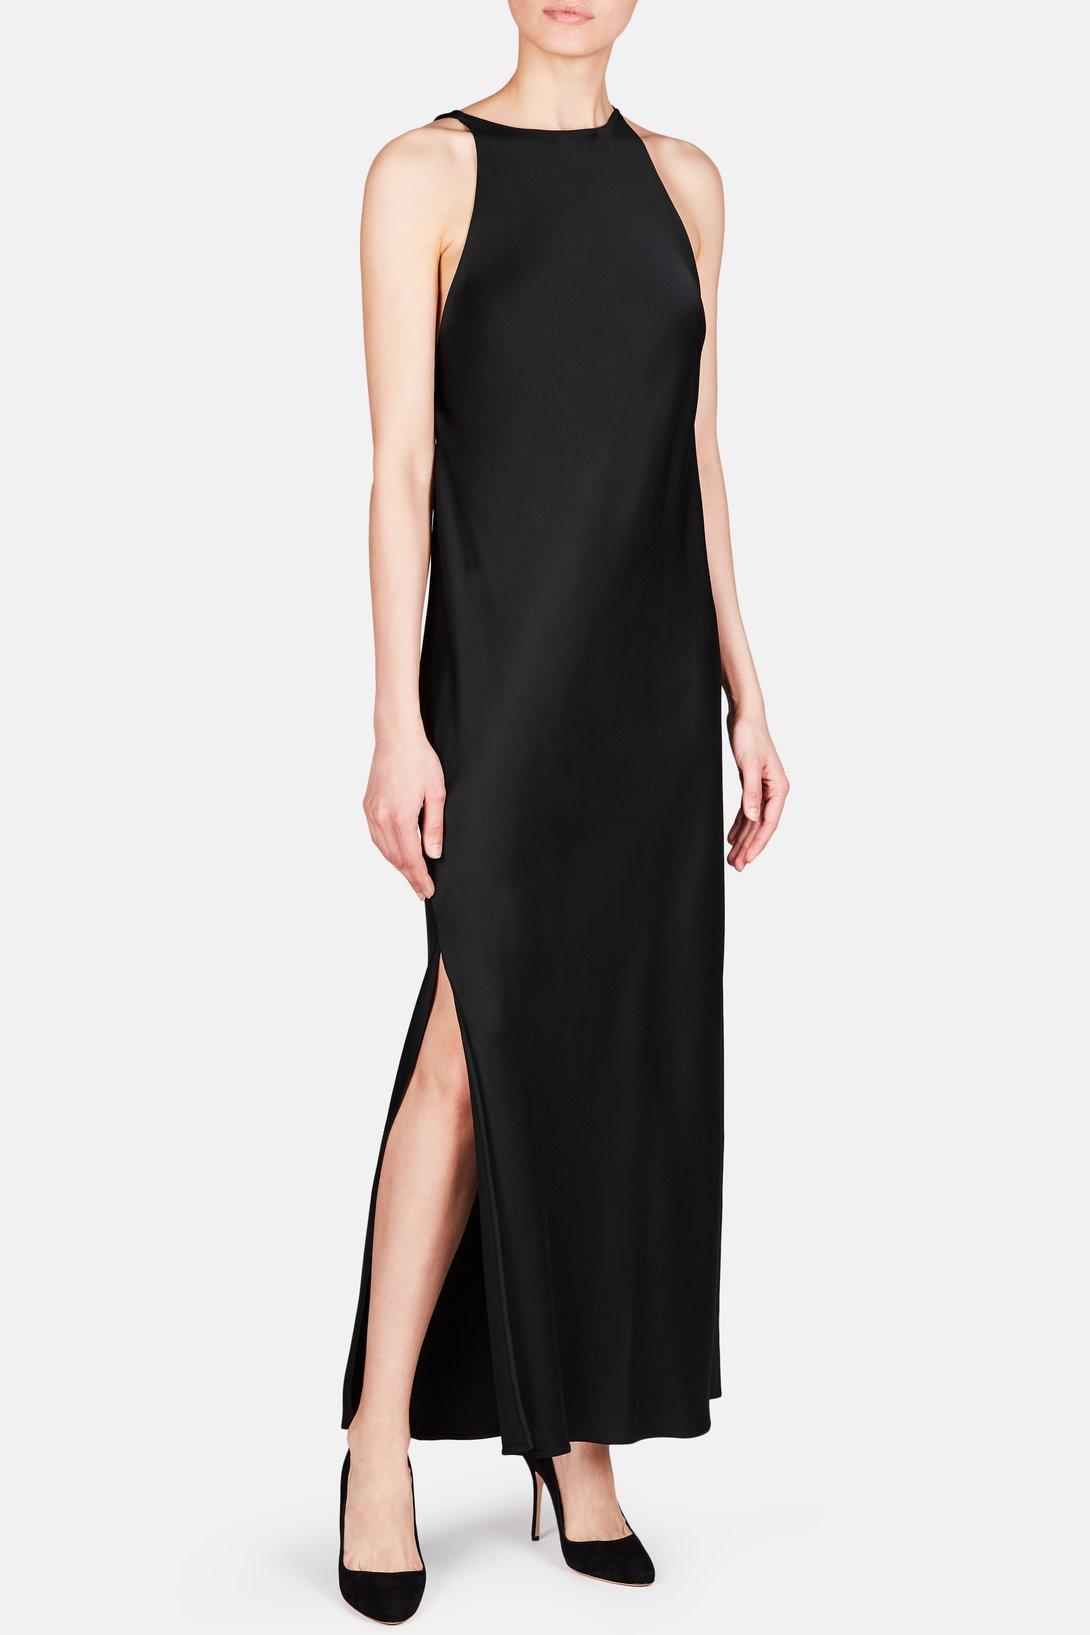 Khaite Dress, Was $1050 / Now $315